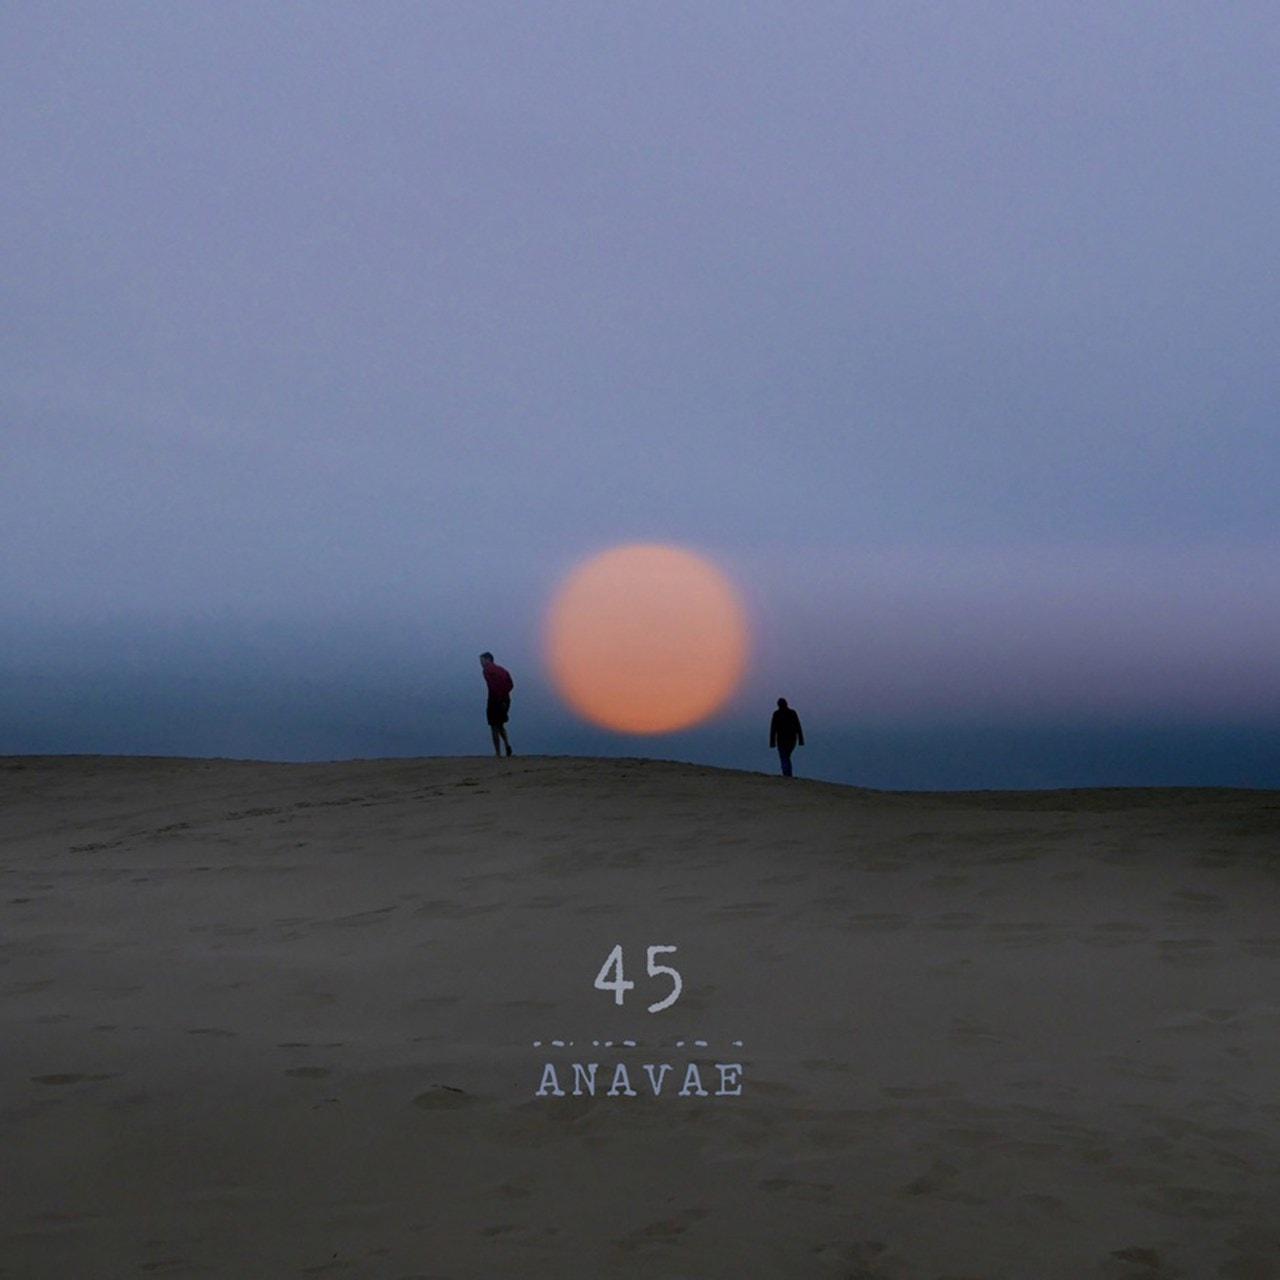 45 - 1